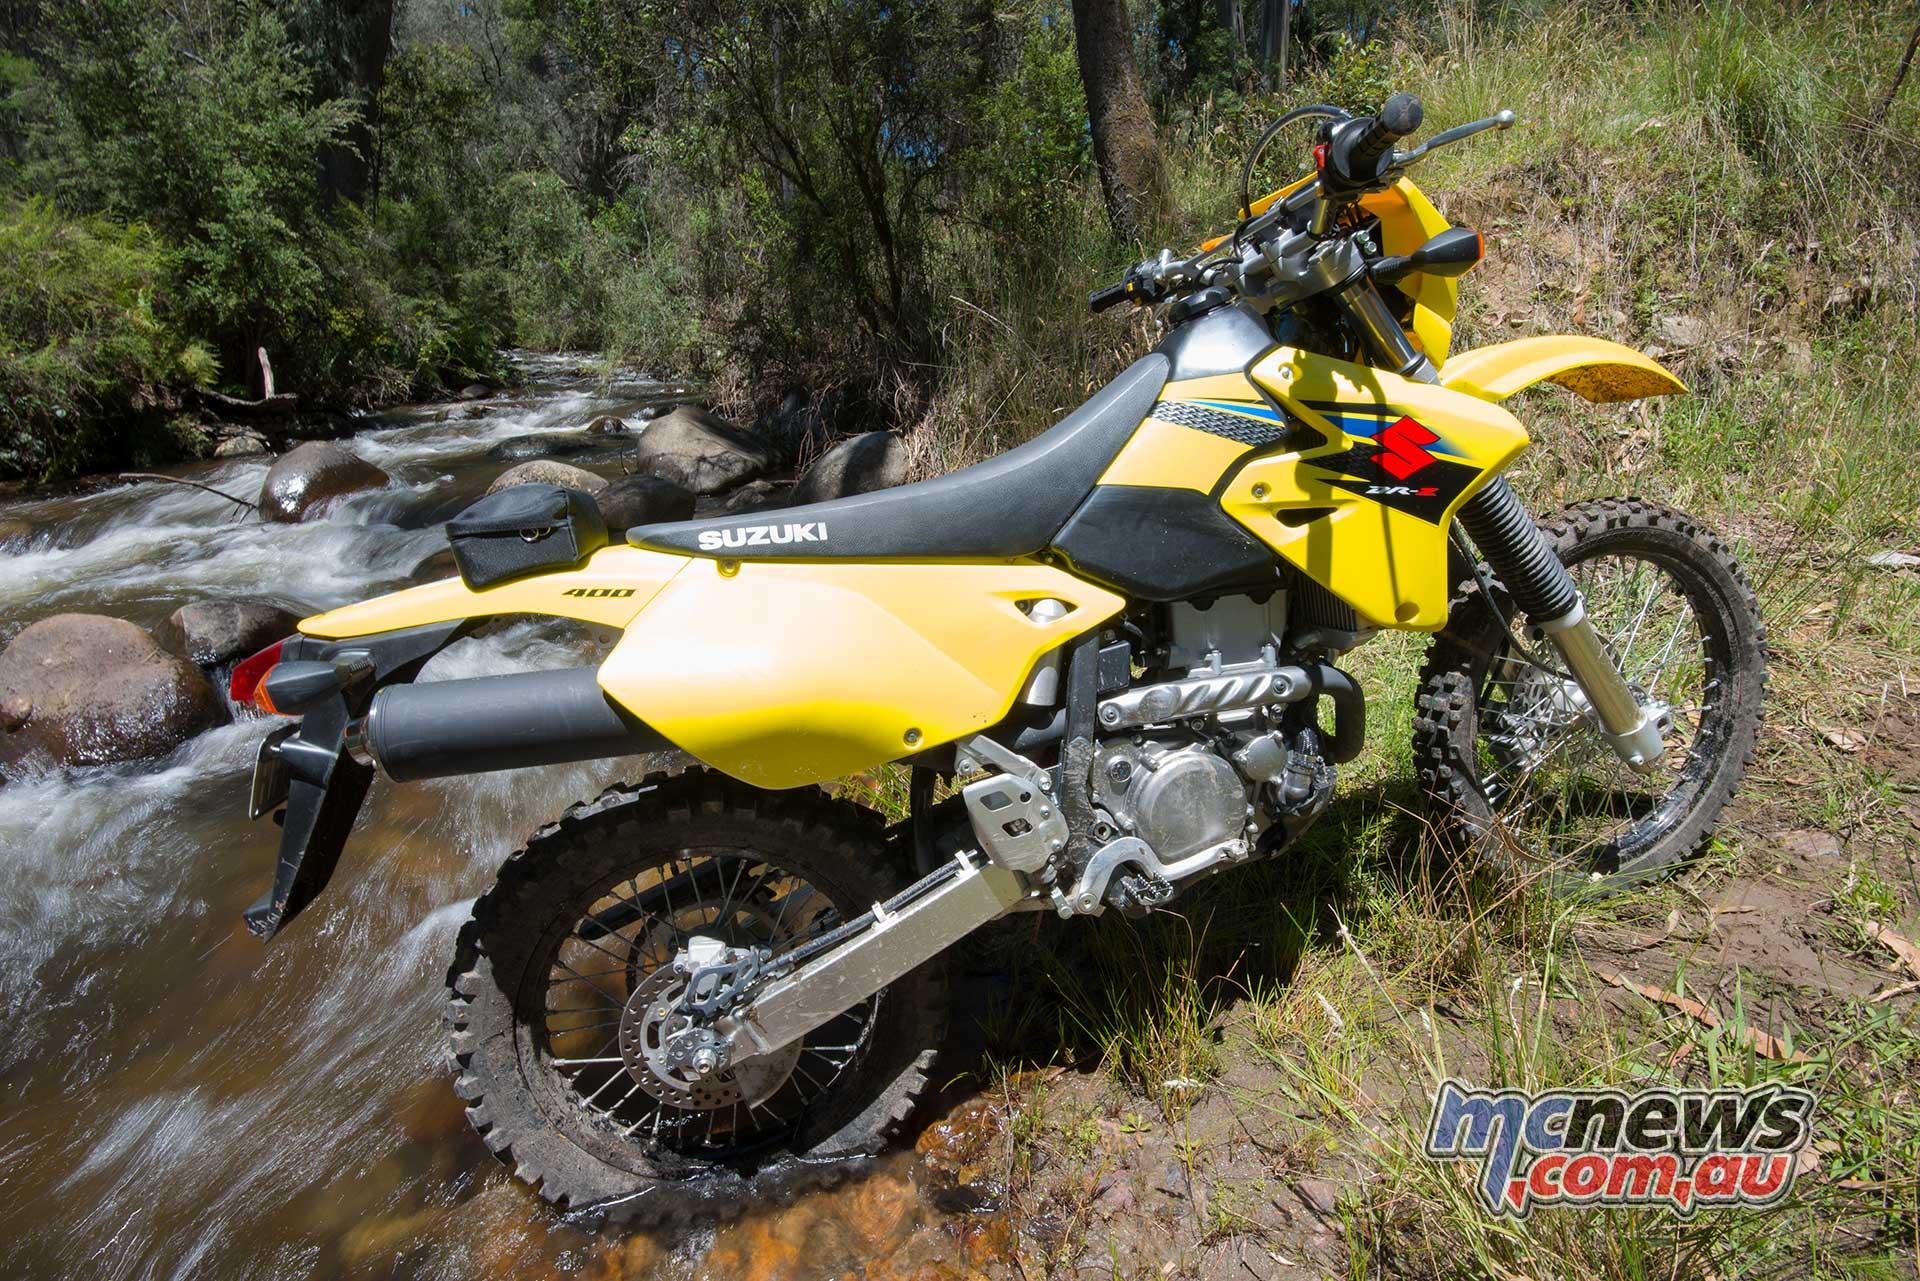 Drz400S et E (on n'est pas sectaire) Suzuki-DR-Z400E-MCN_4845